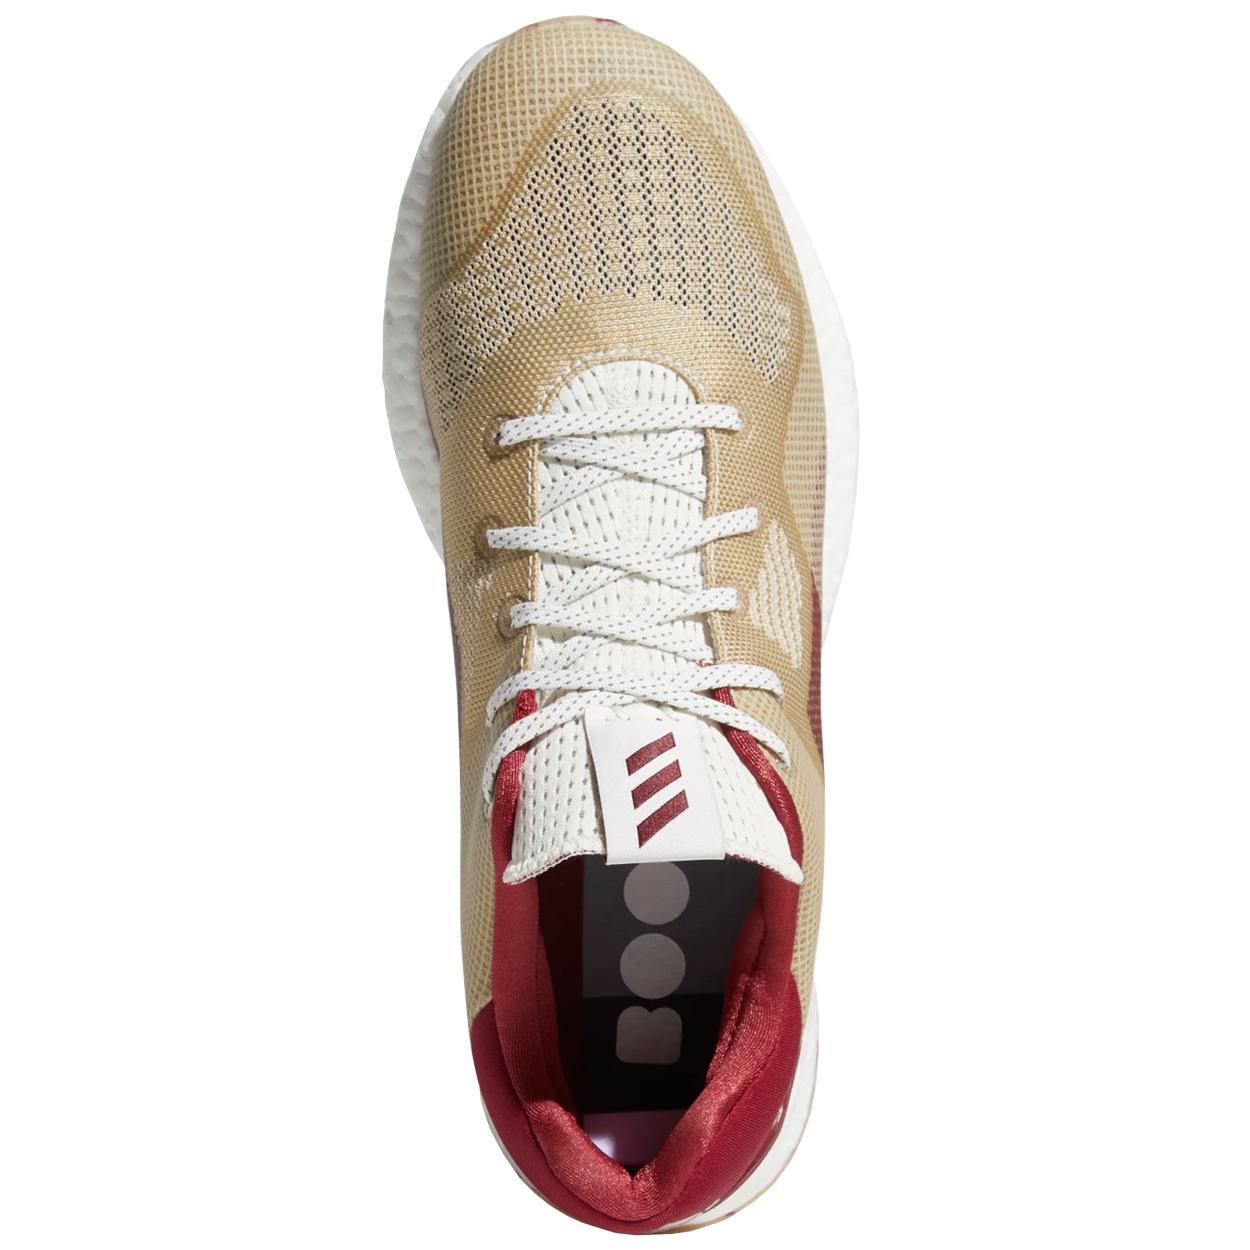 thumbnail 16 - Adidas Men's Crossknit DPR Spikeless Golf Shoes,  Brand New